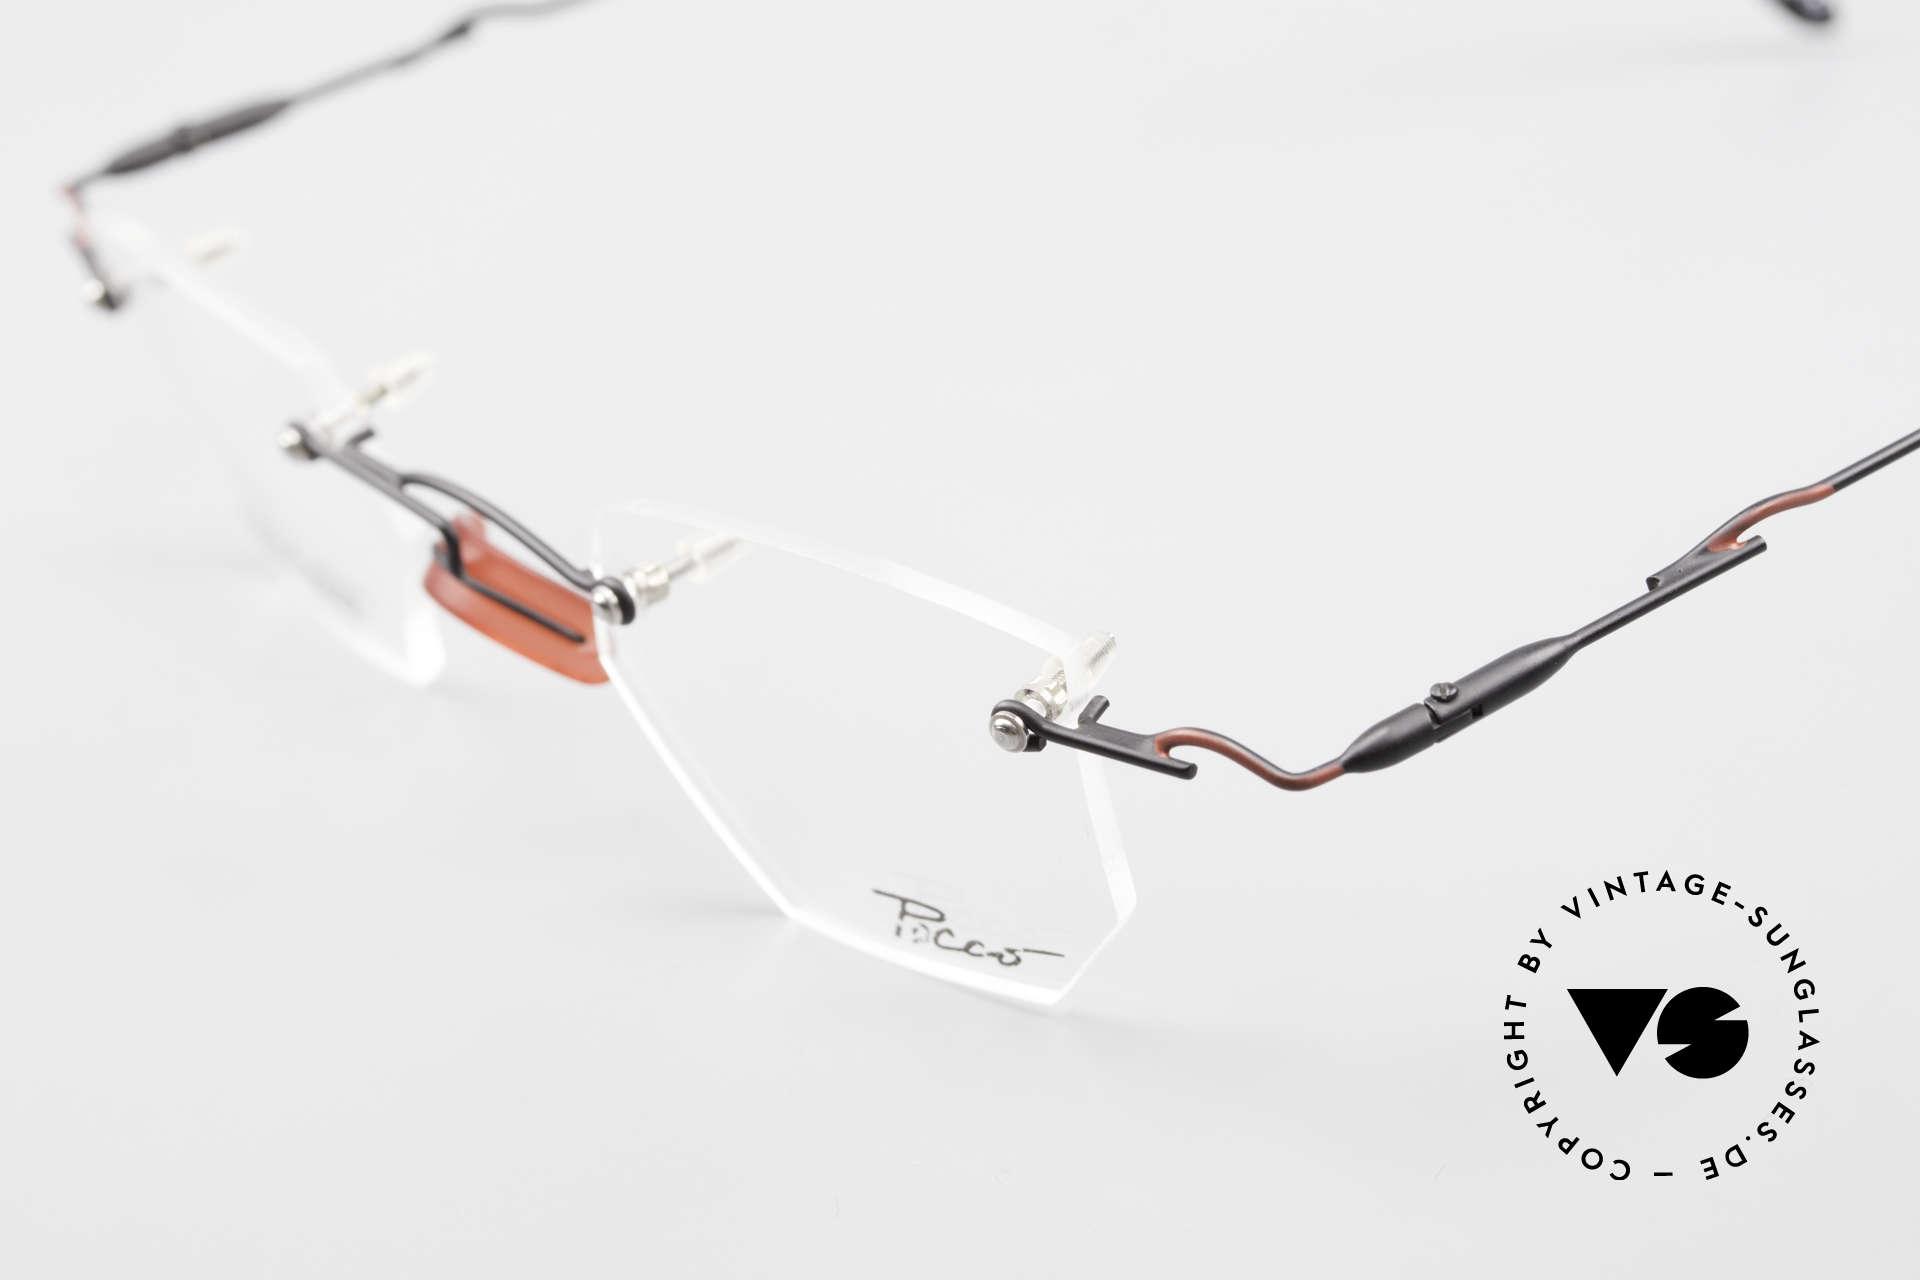 Locco Profile Crazy Vintage Eyeglasses 90's, NO RETRO eyeglasses, but an old 1990's ORIGINAL, Made for Men and Women